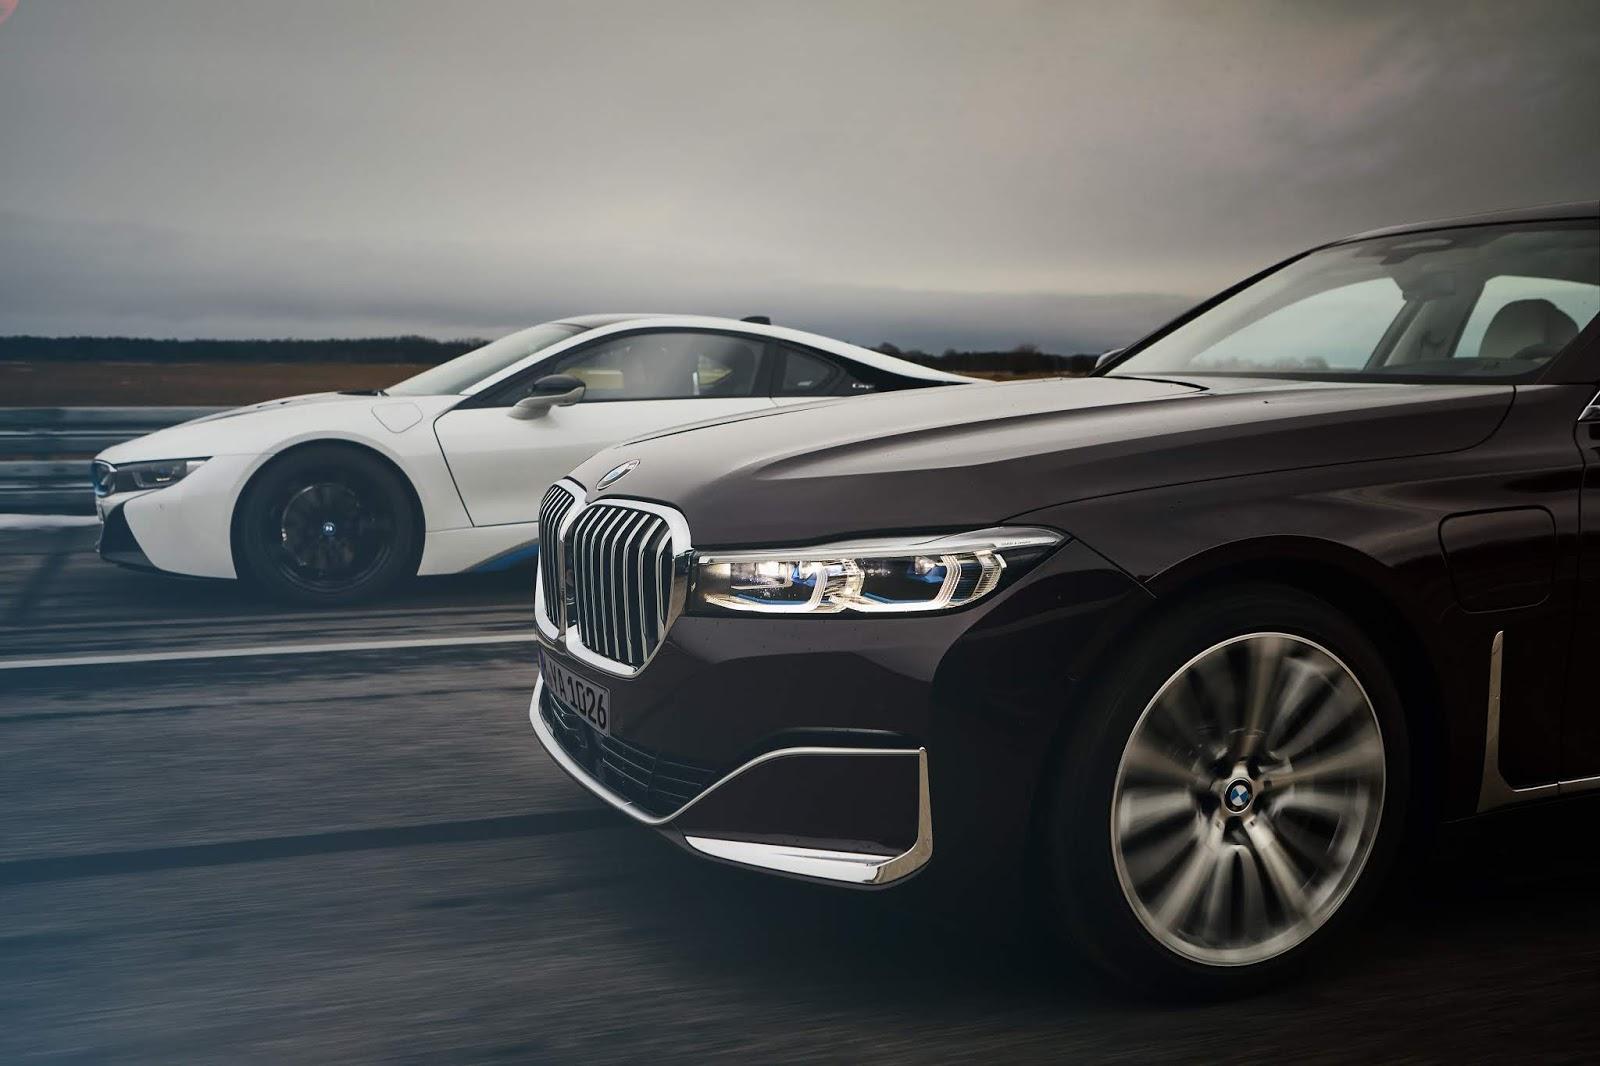 P90335203 highRes the new bmw 745le an Τα αστέρια της BMW για τη 89η Διεθνή Έκθεση Αυτοκινήτου της Γενεύης BMW, BMW 7-series, Electric cars, Hybrid, Έκθεση, Έκθεση Γενεύης